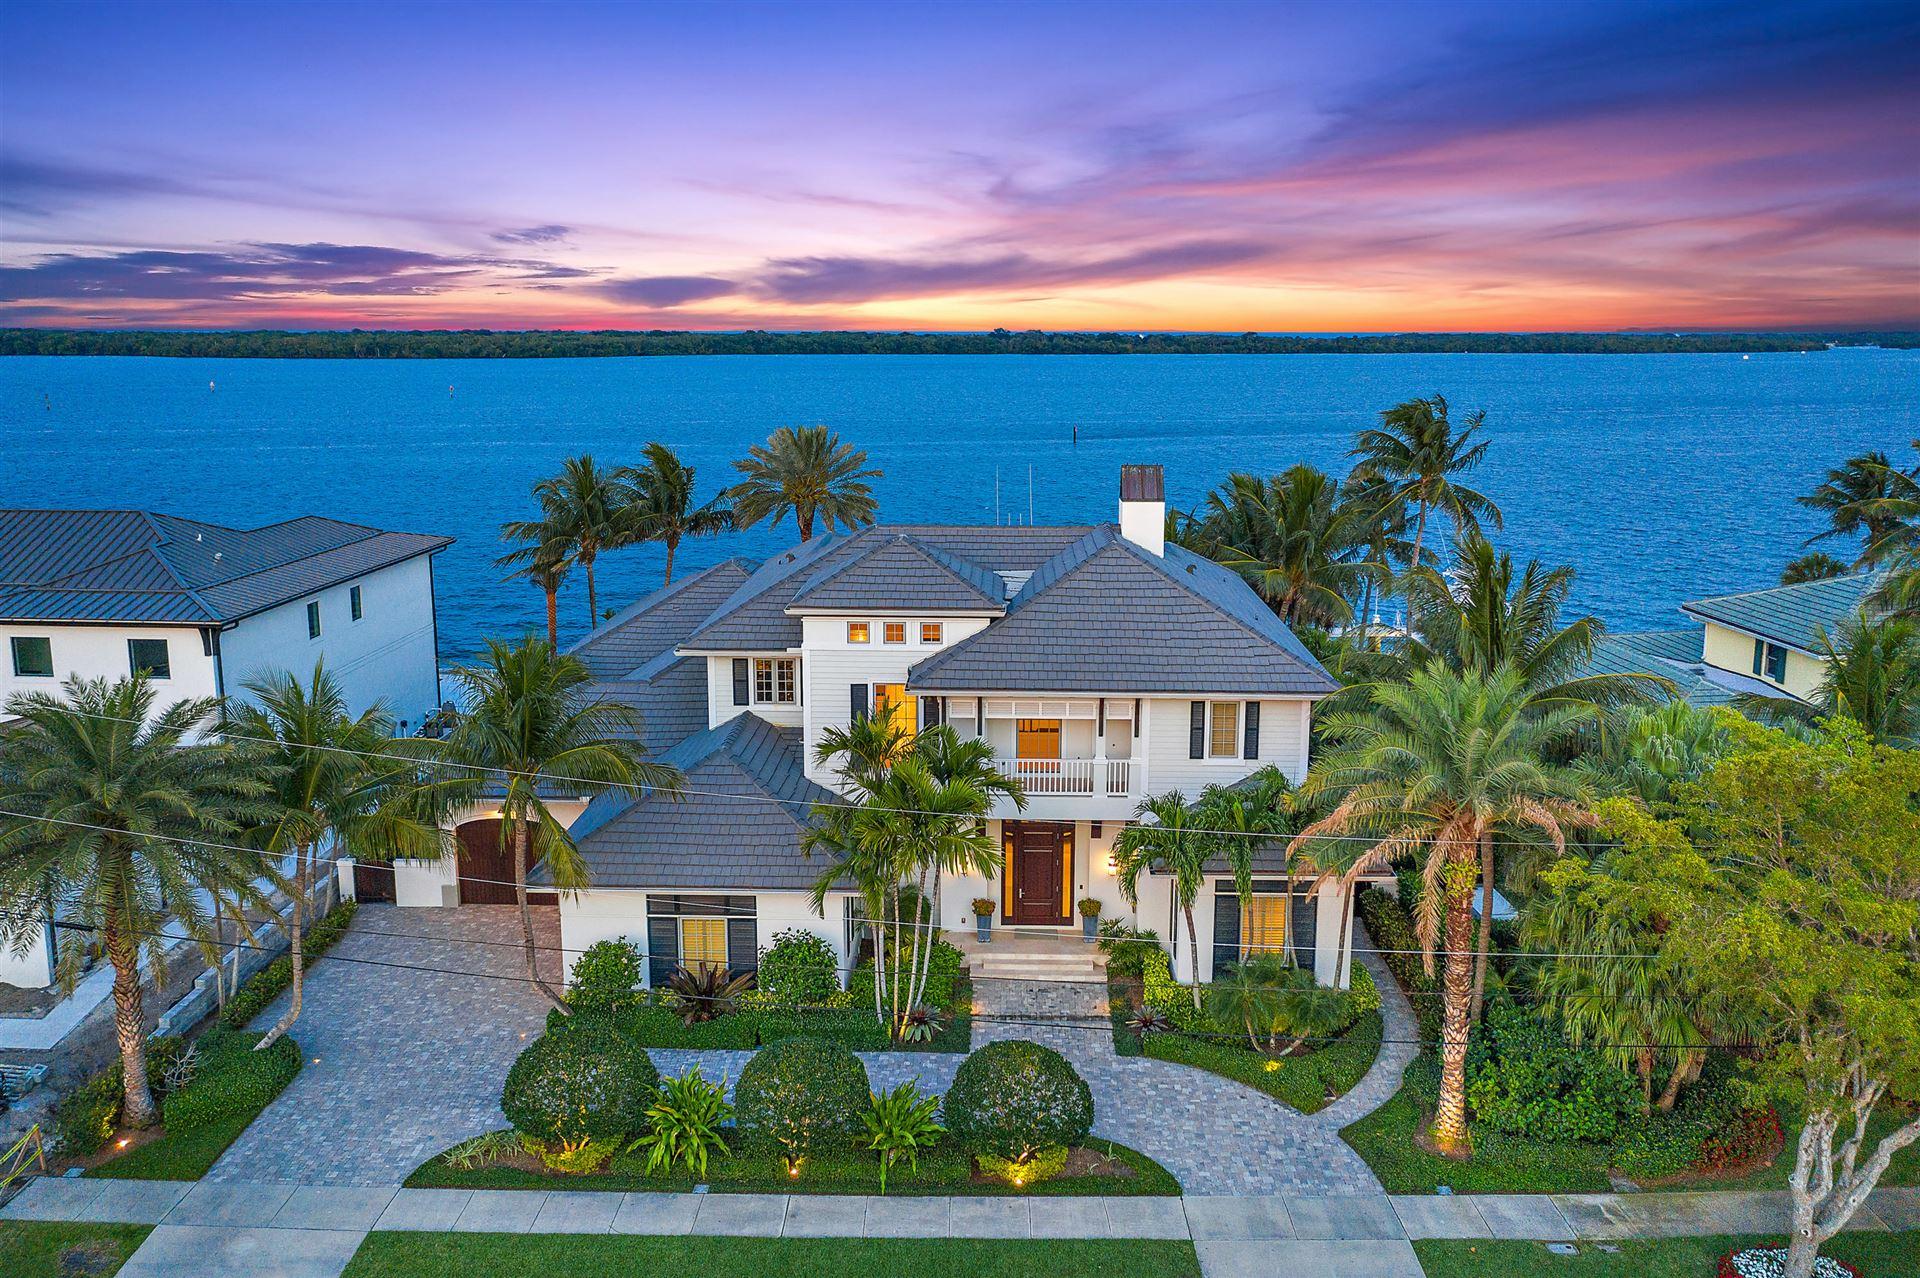 Photo of 860 Lakeside Drive, North Palm Beach, FL 33408 (MLS # RX-10711681)